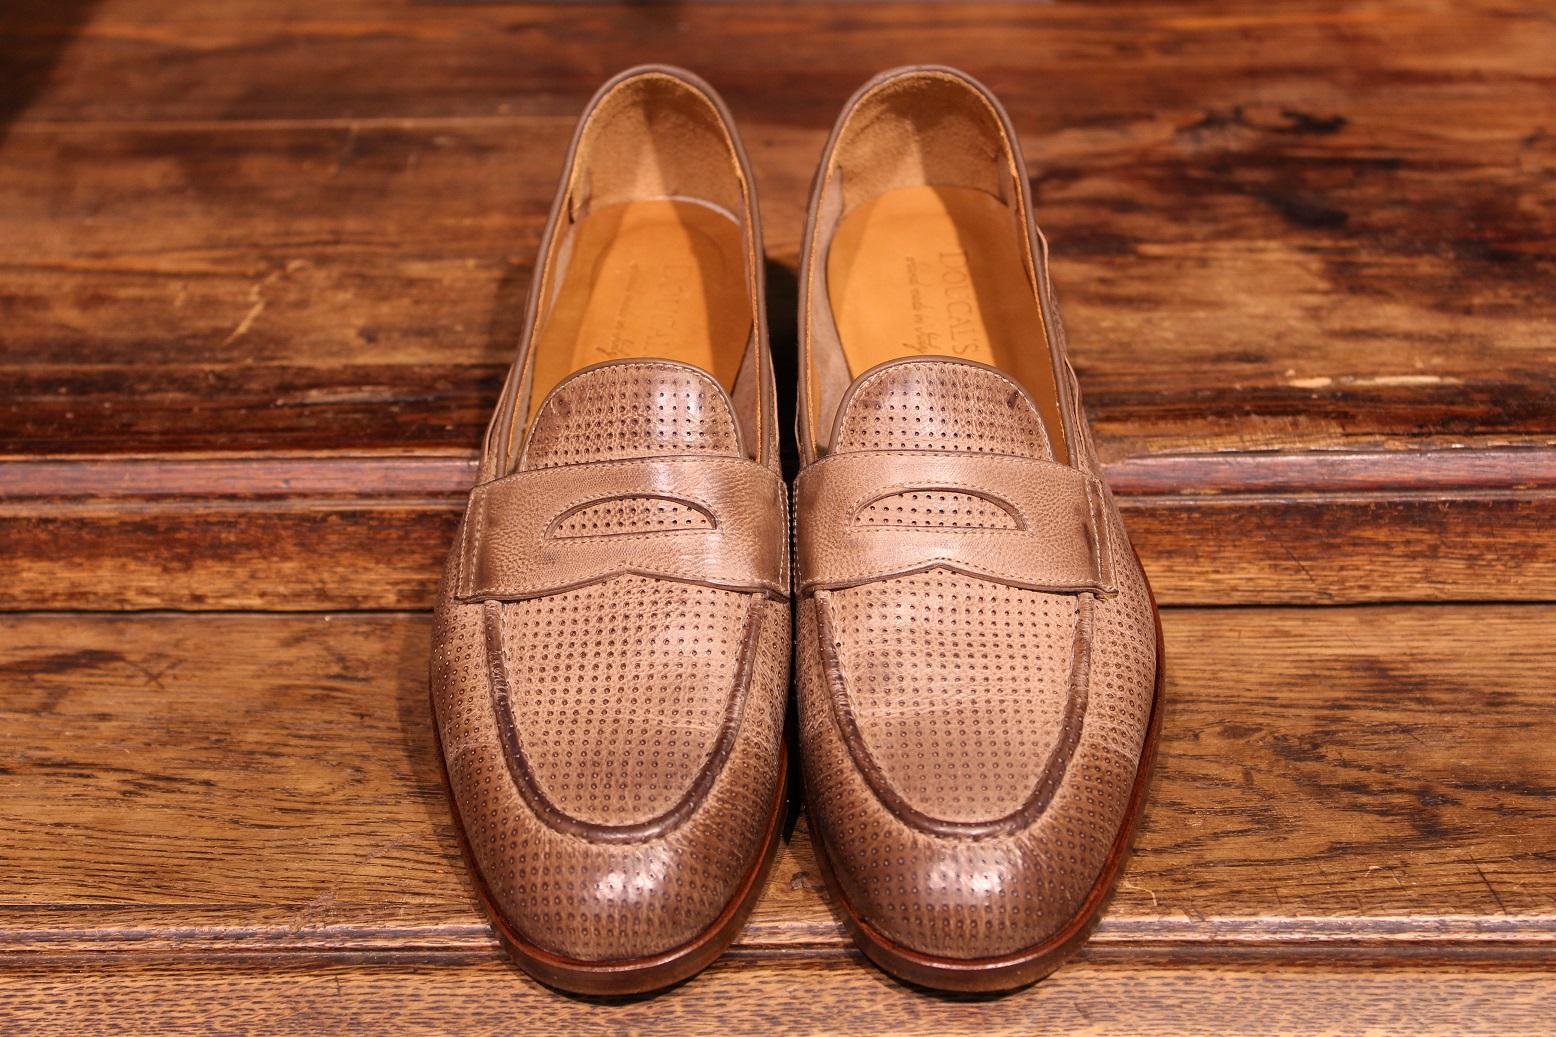 gallery_1_anglijskaja-jelegantnost-i-italjanskij-komfort-jekskljuzivnoj-obuvi-doucals-6